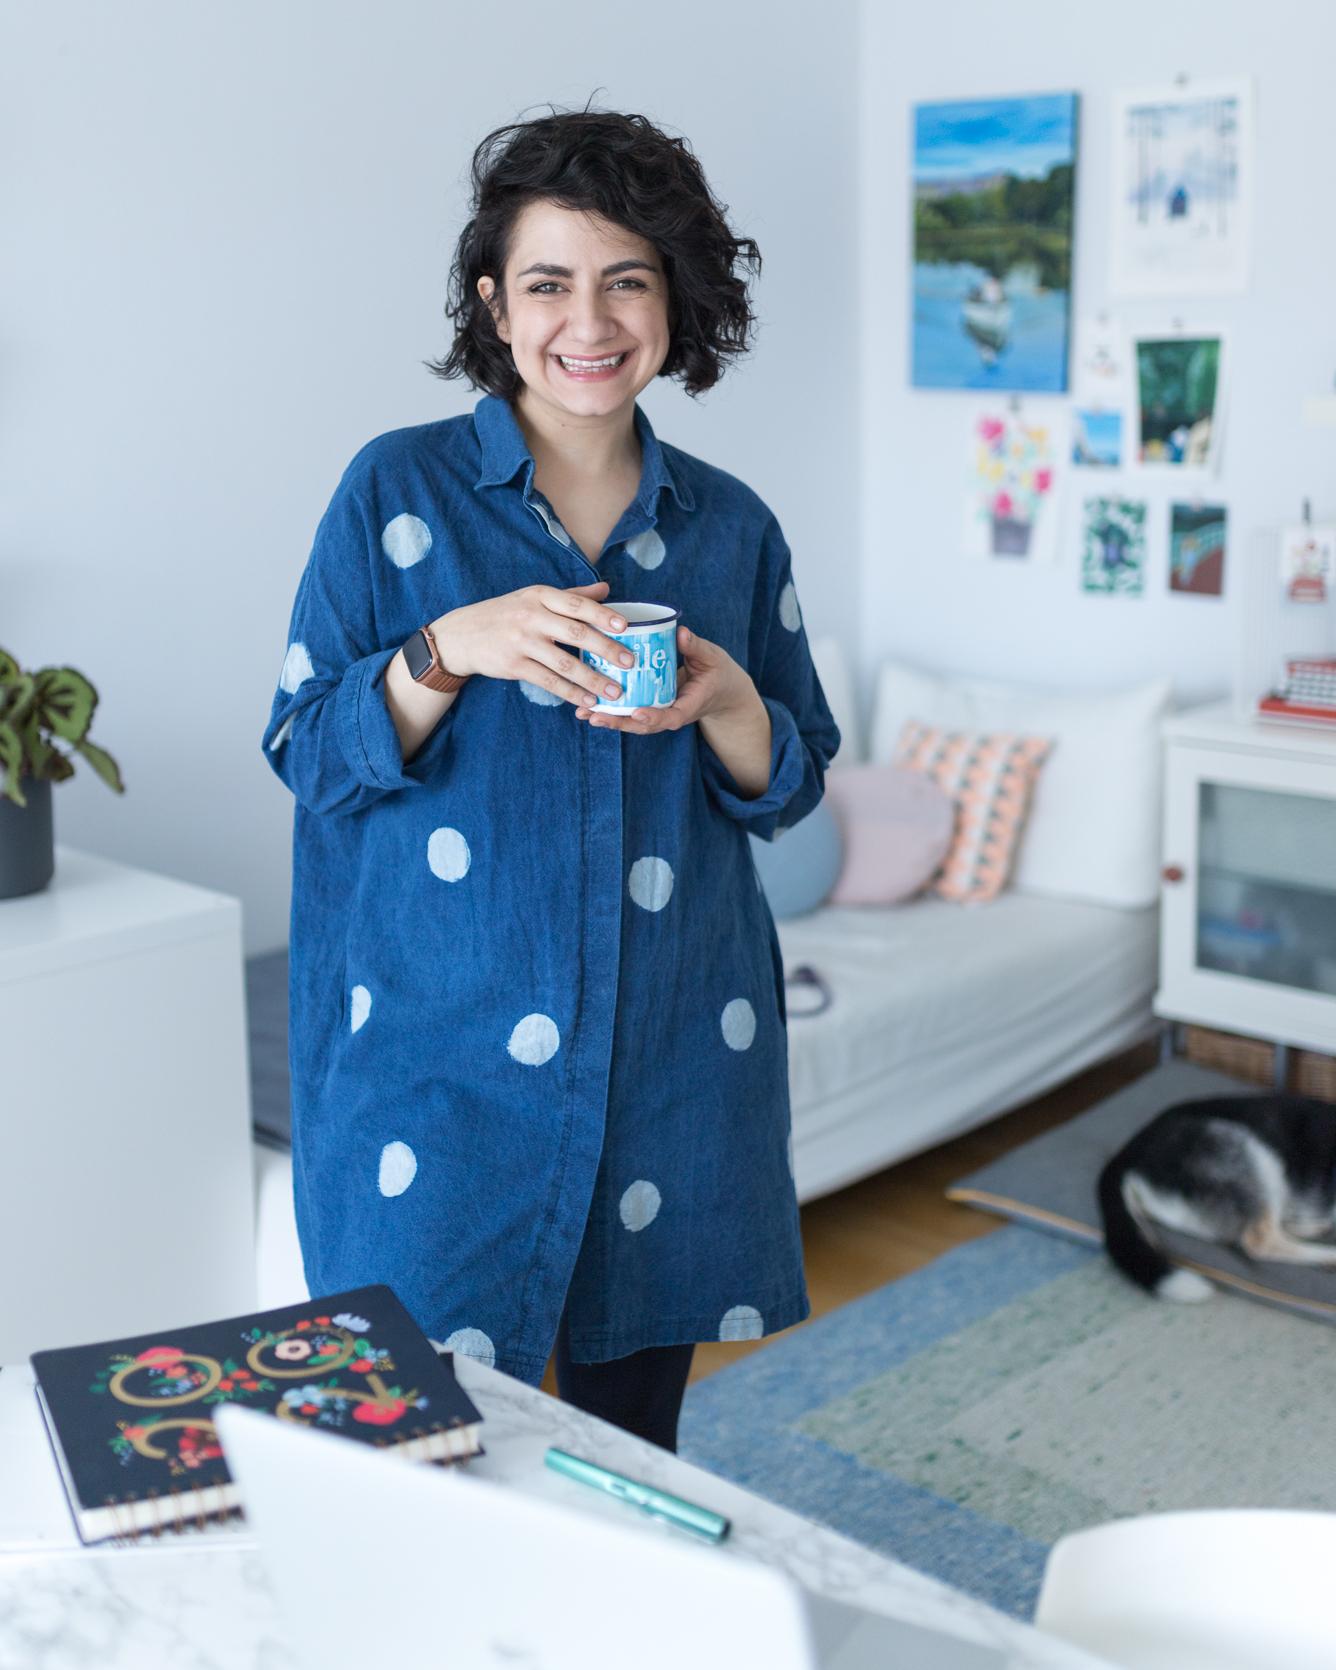 Tweed & Greet Blog by Selmin Ermis-Krohs | Celebrating Creative & Slow Living